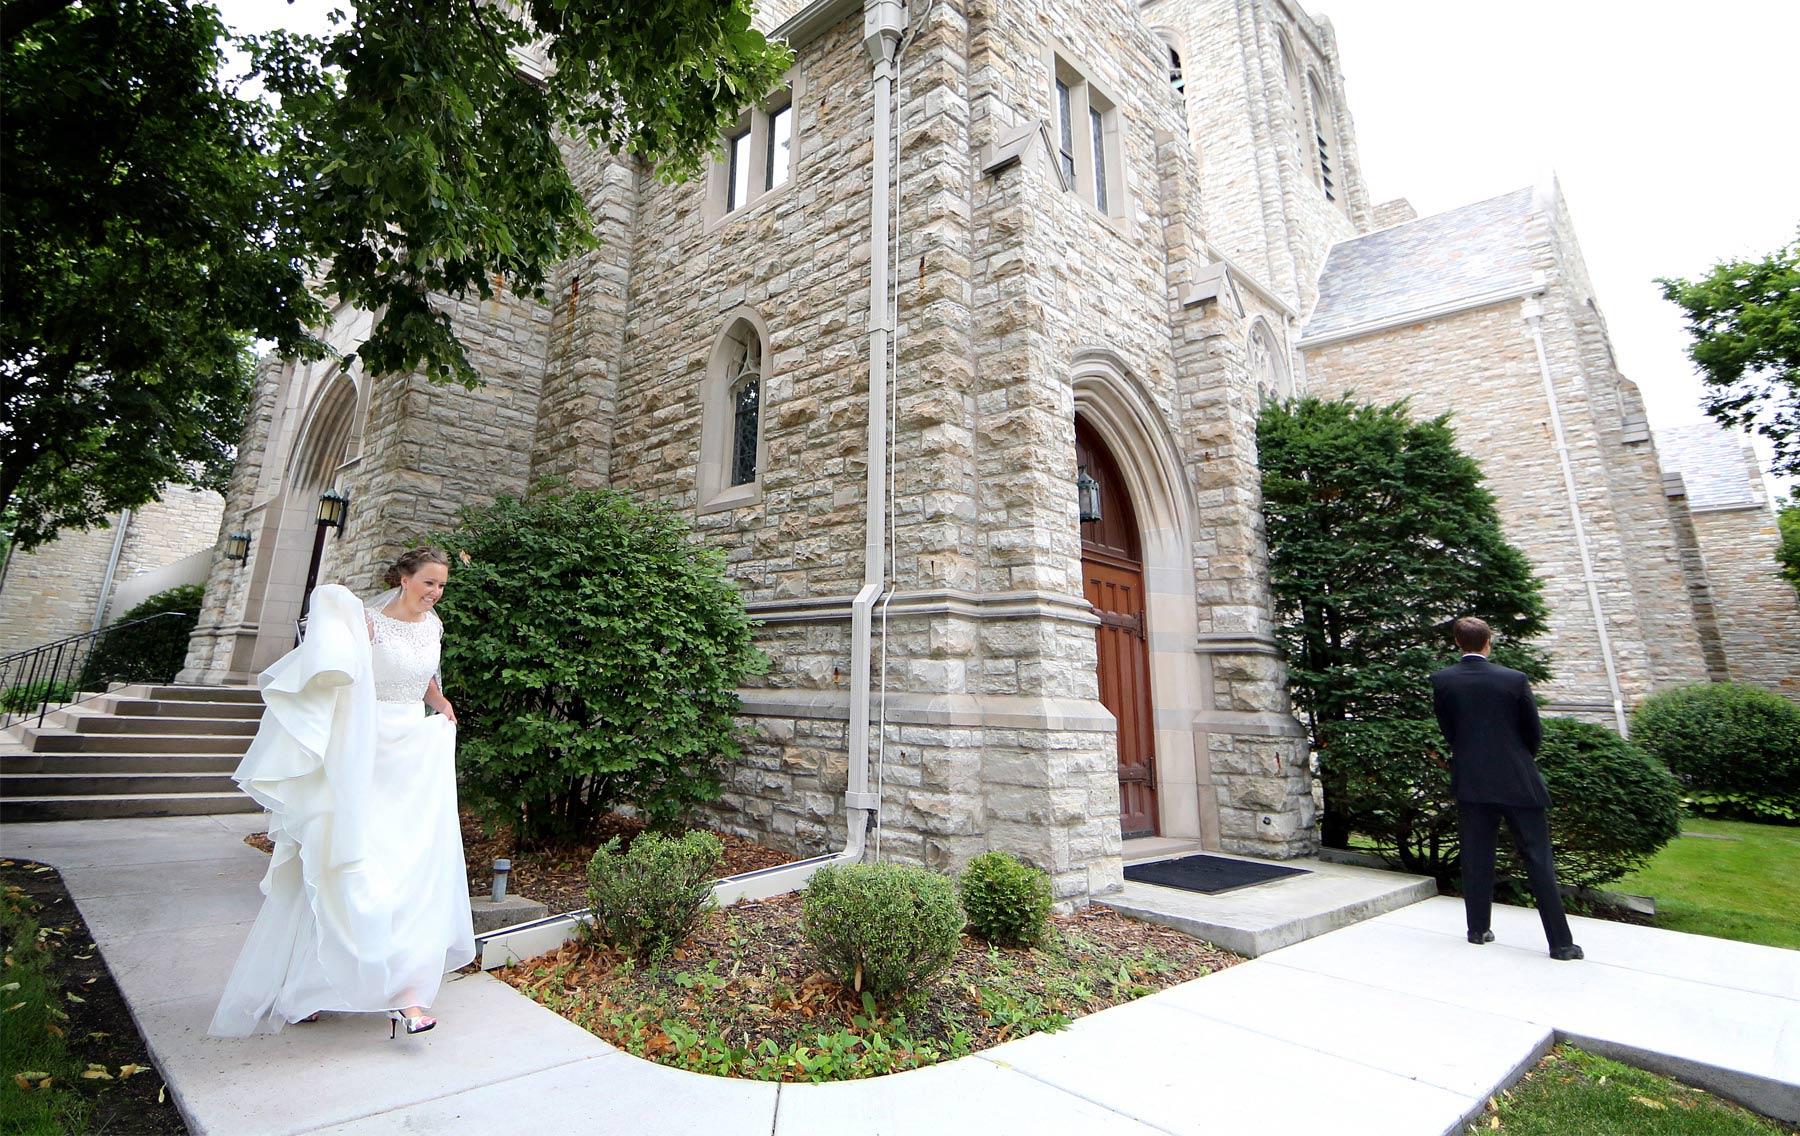 03-Minneapolis-Minnesota-Wedding-Photography-by-Vick-Photography-Edina-First-Look-Grace-&-Nick.jpg